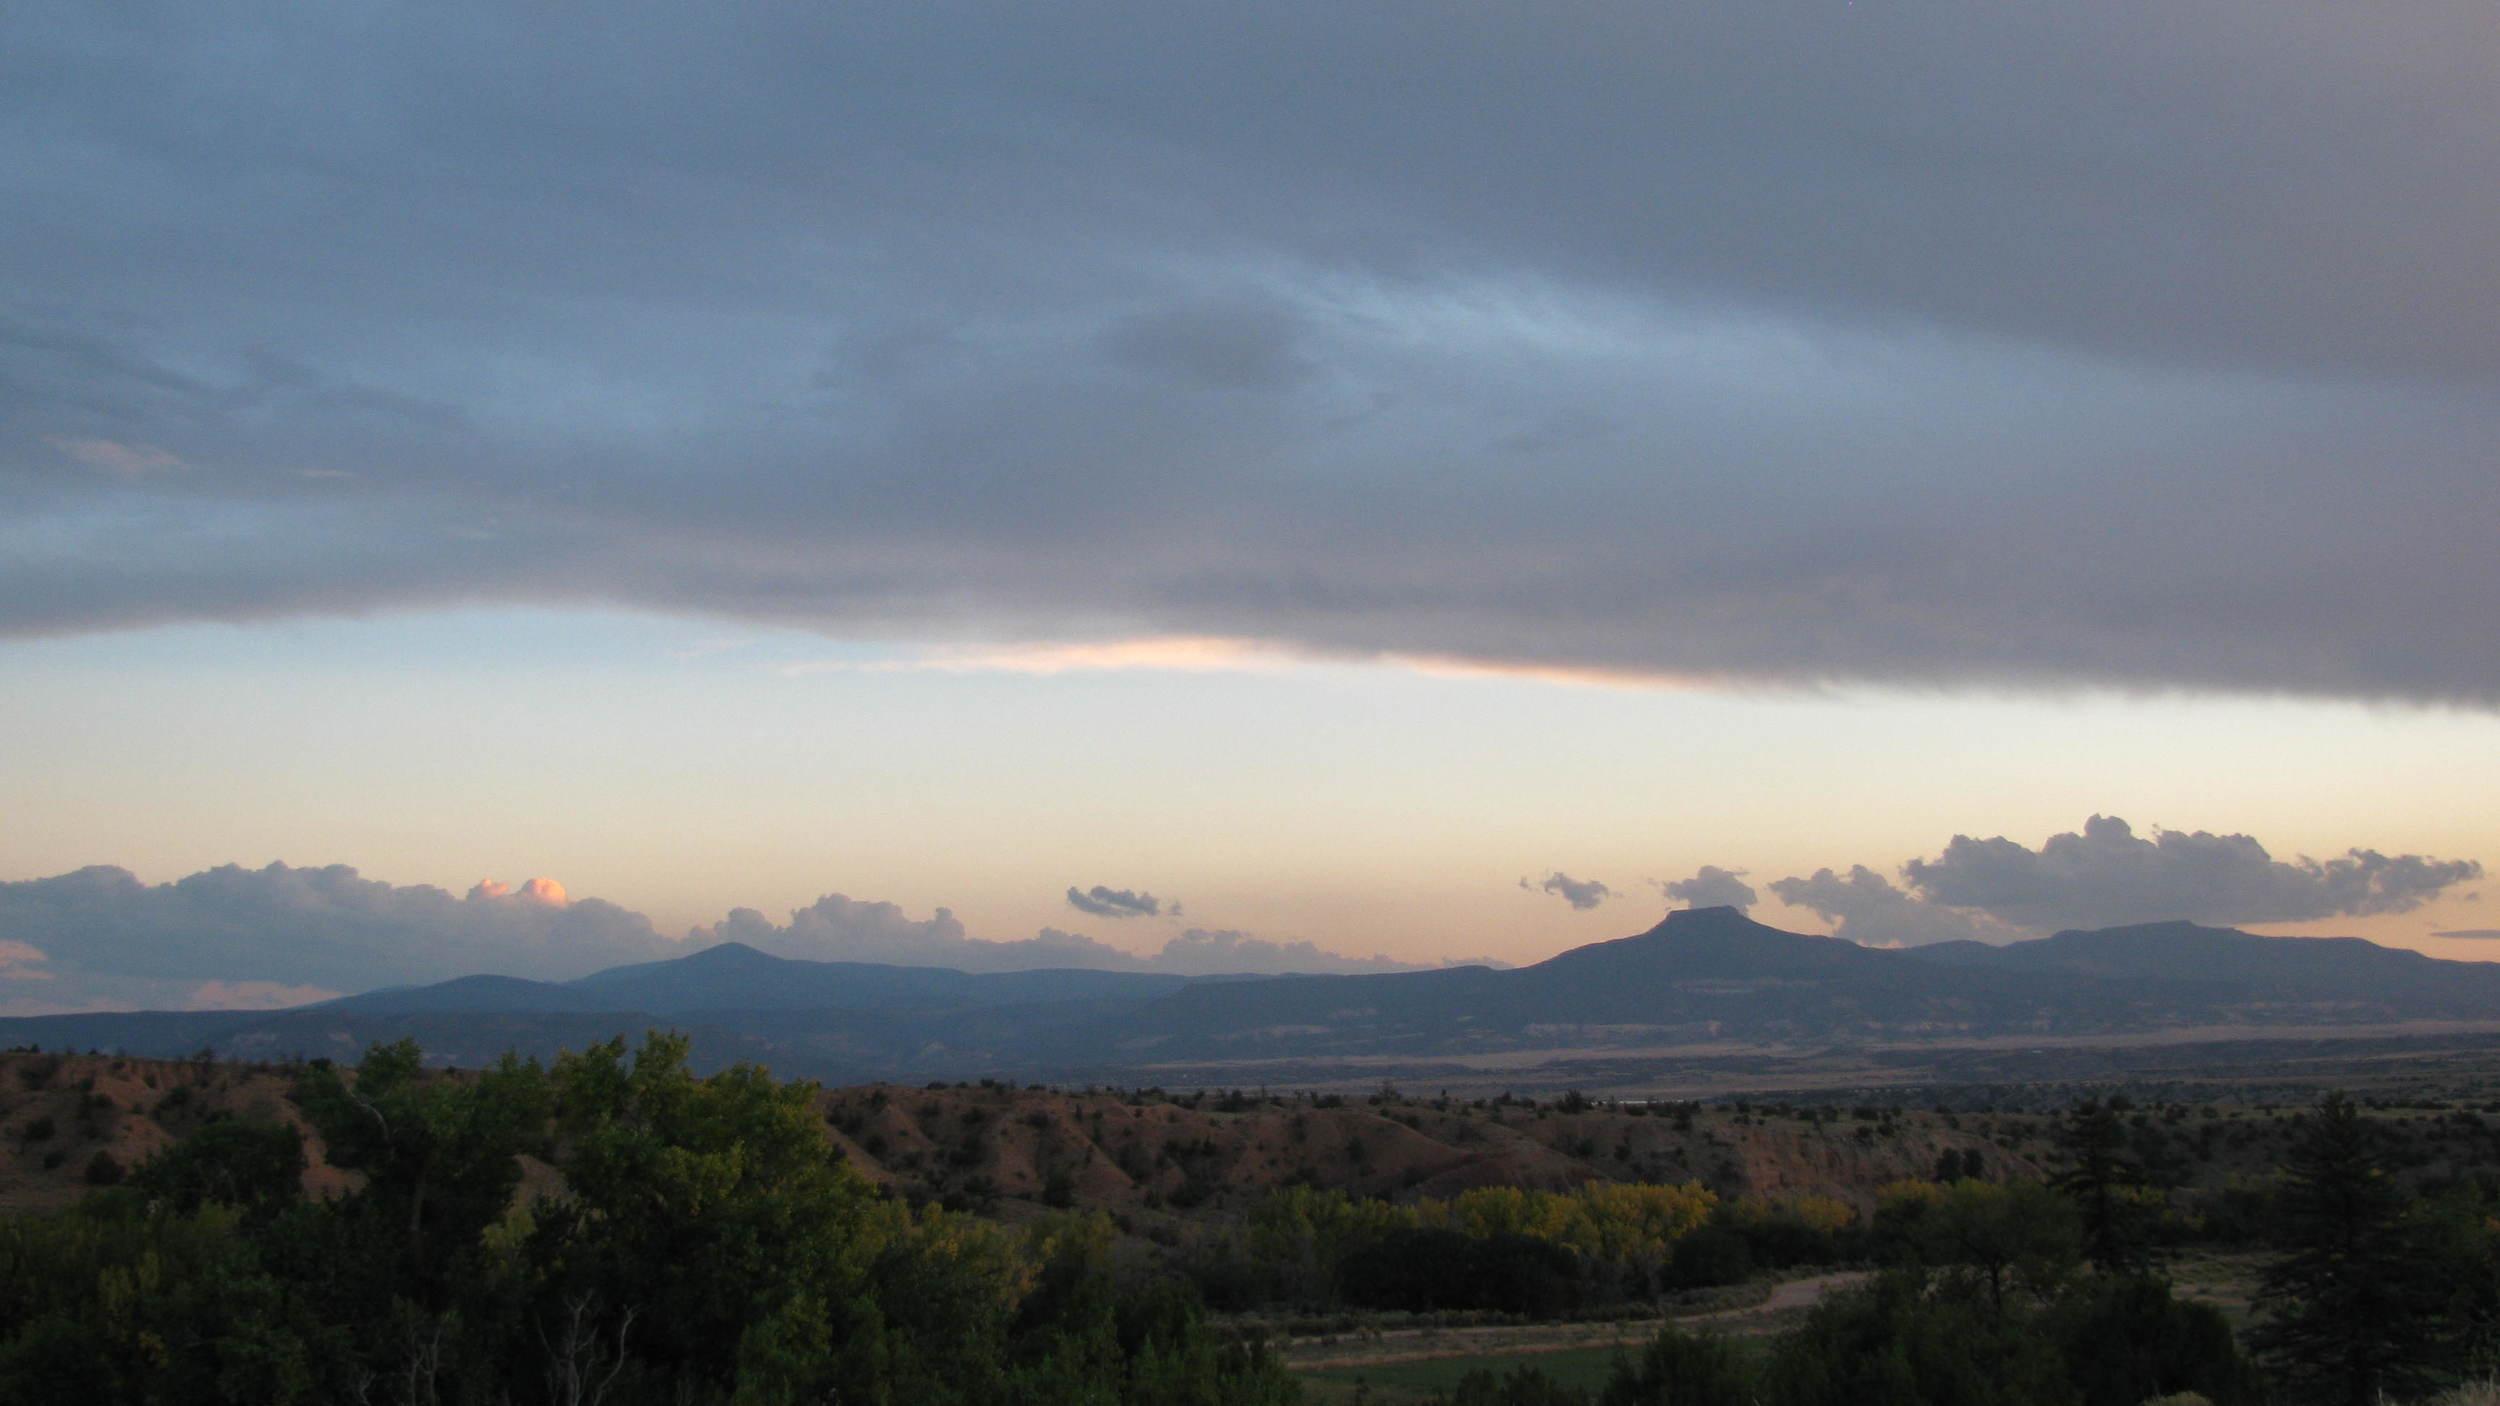 Copy of New Mexico 2010 096.jpg